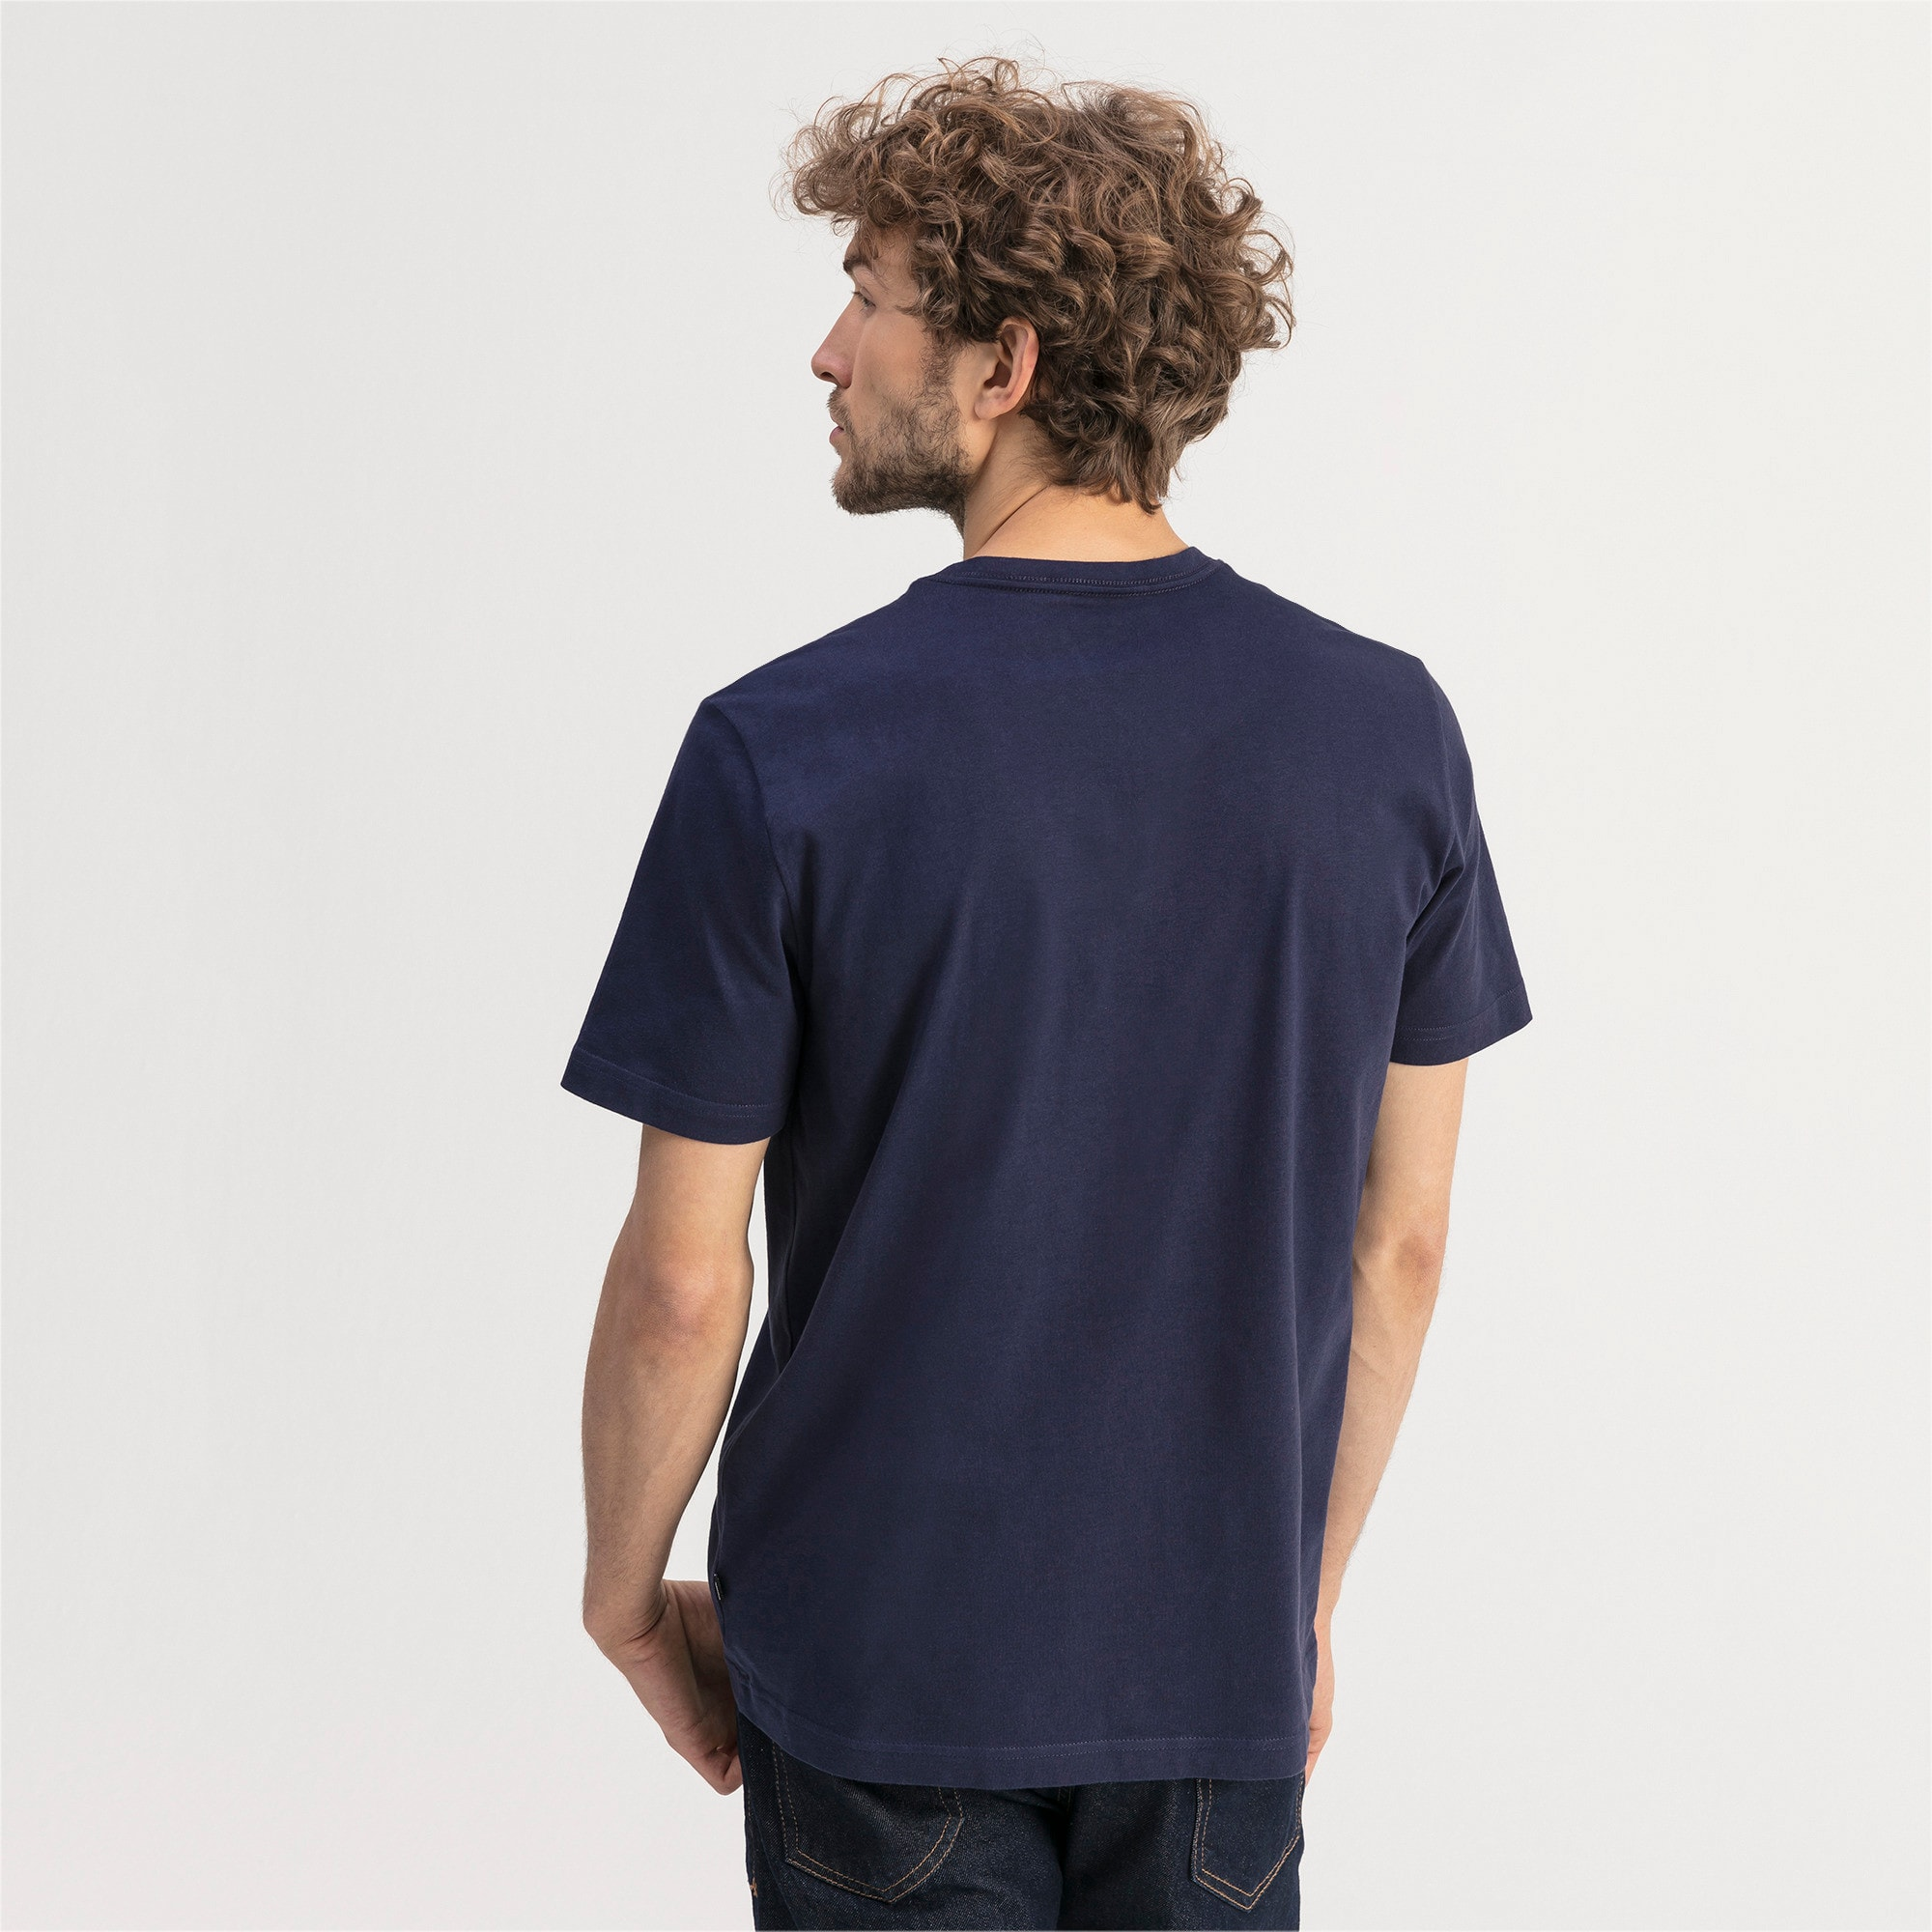 Thumbnail 2 of T-shirt con scollo a V Essentials uomo, Peacoat, medium